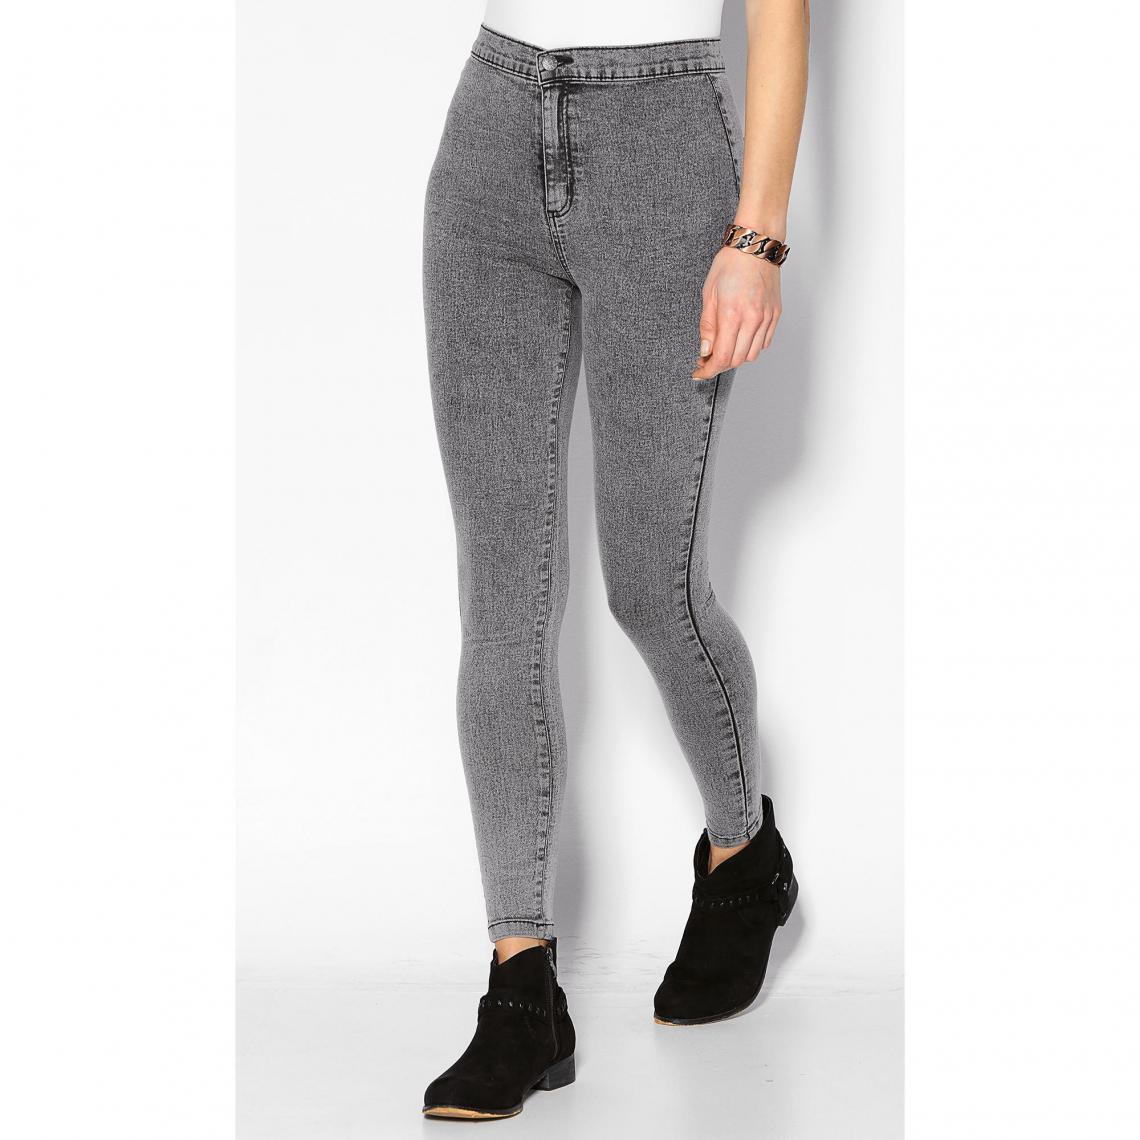 latest discount cute order online Jean taille haute coupe skinny femme - Denim Noir | 3 SUISSES